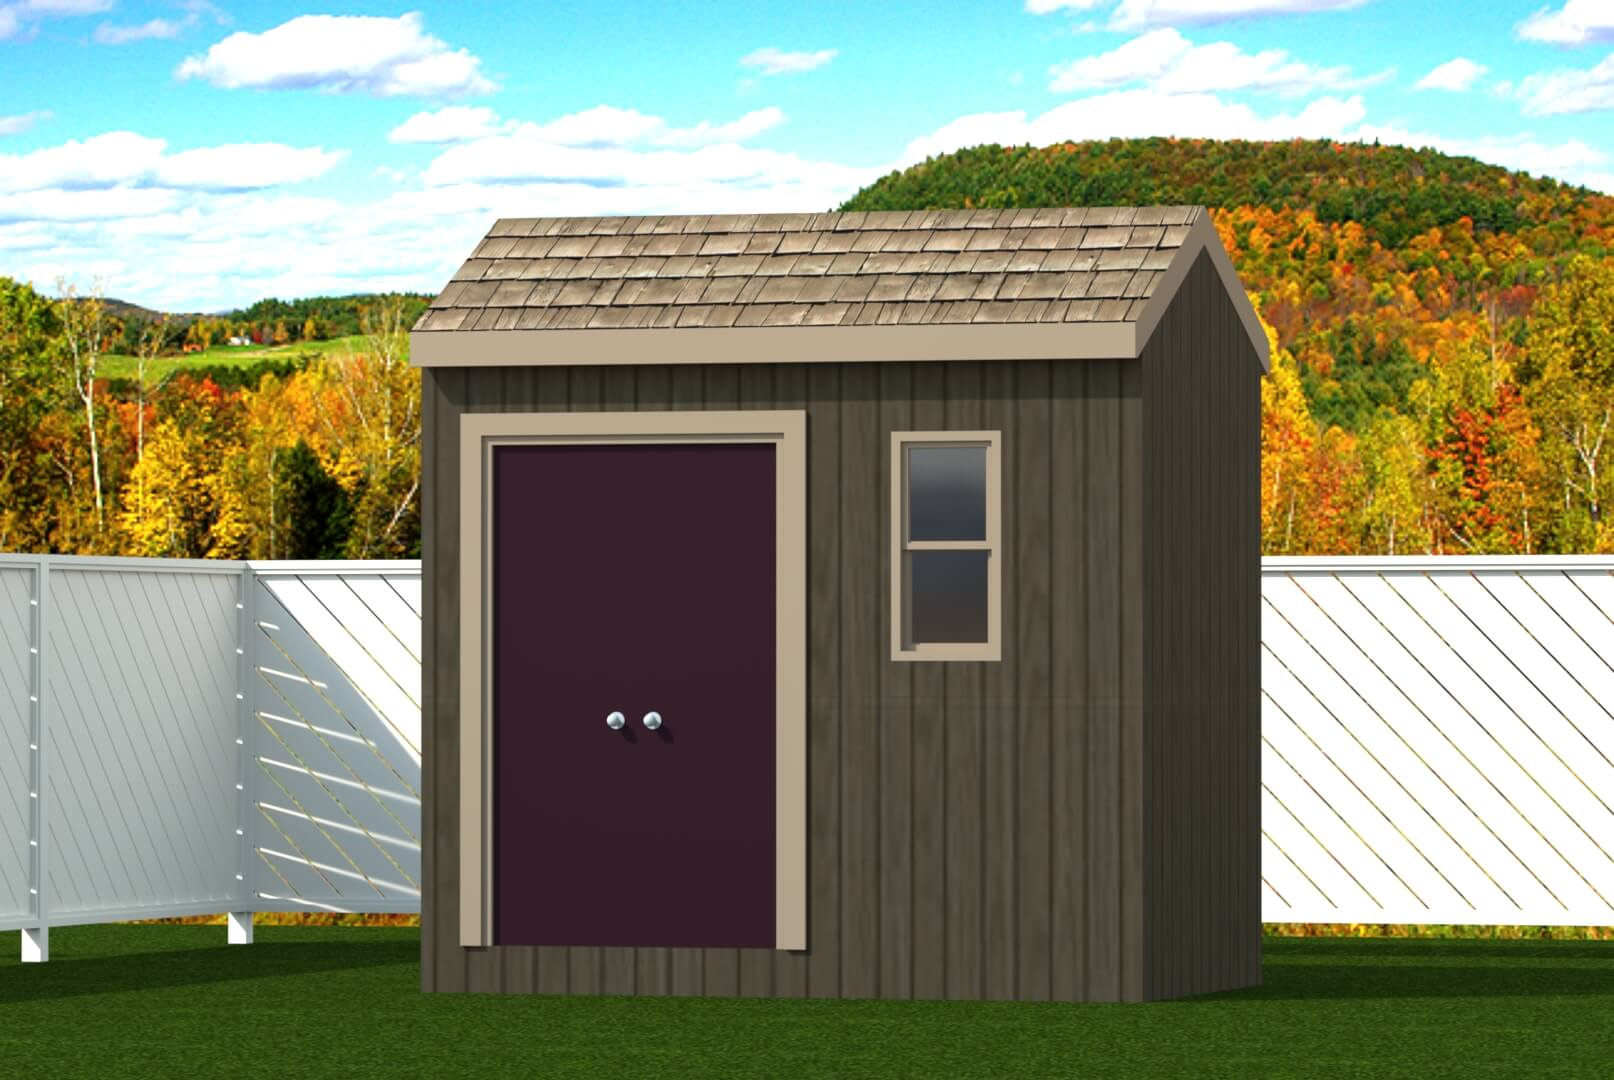 6_x_10_shed elevation